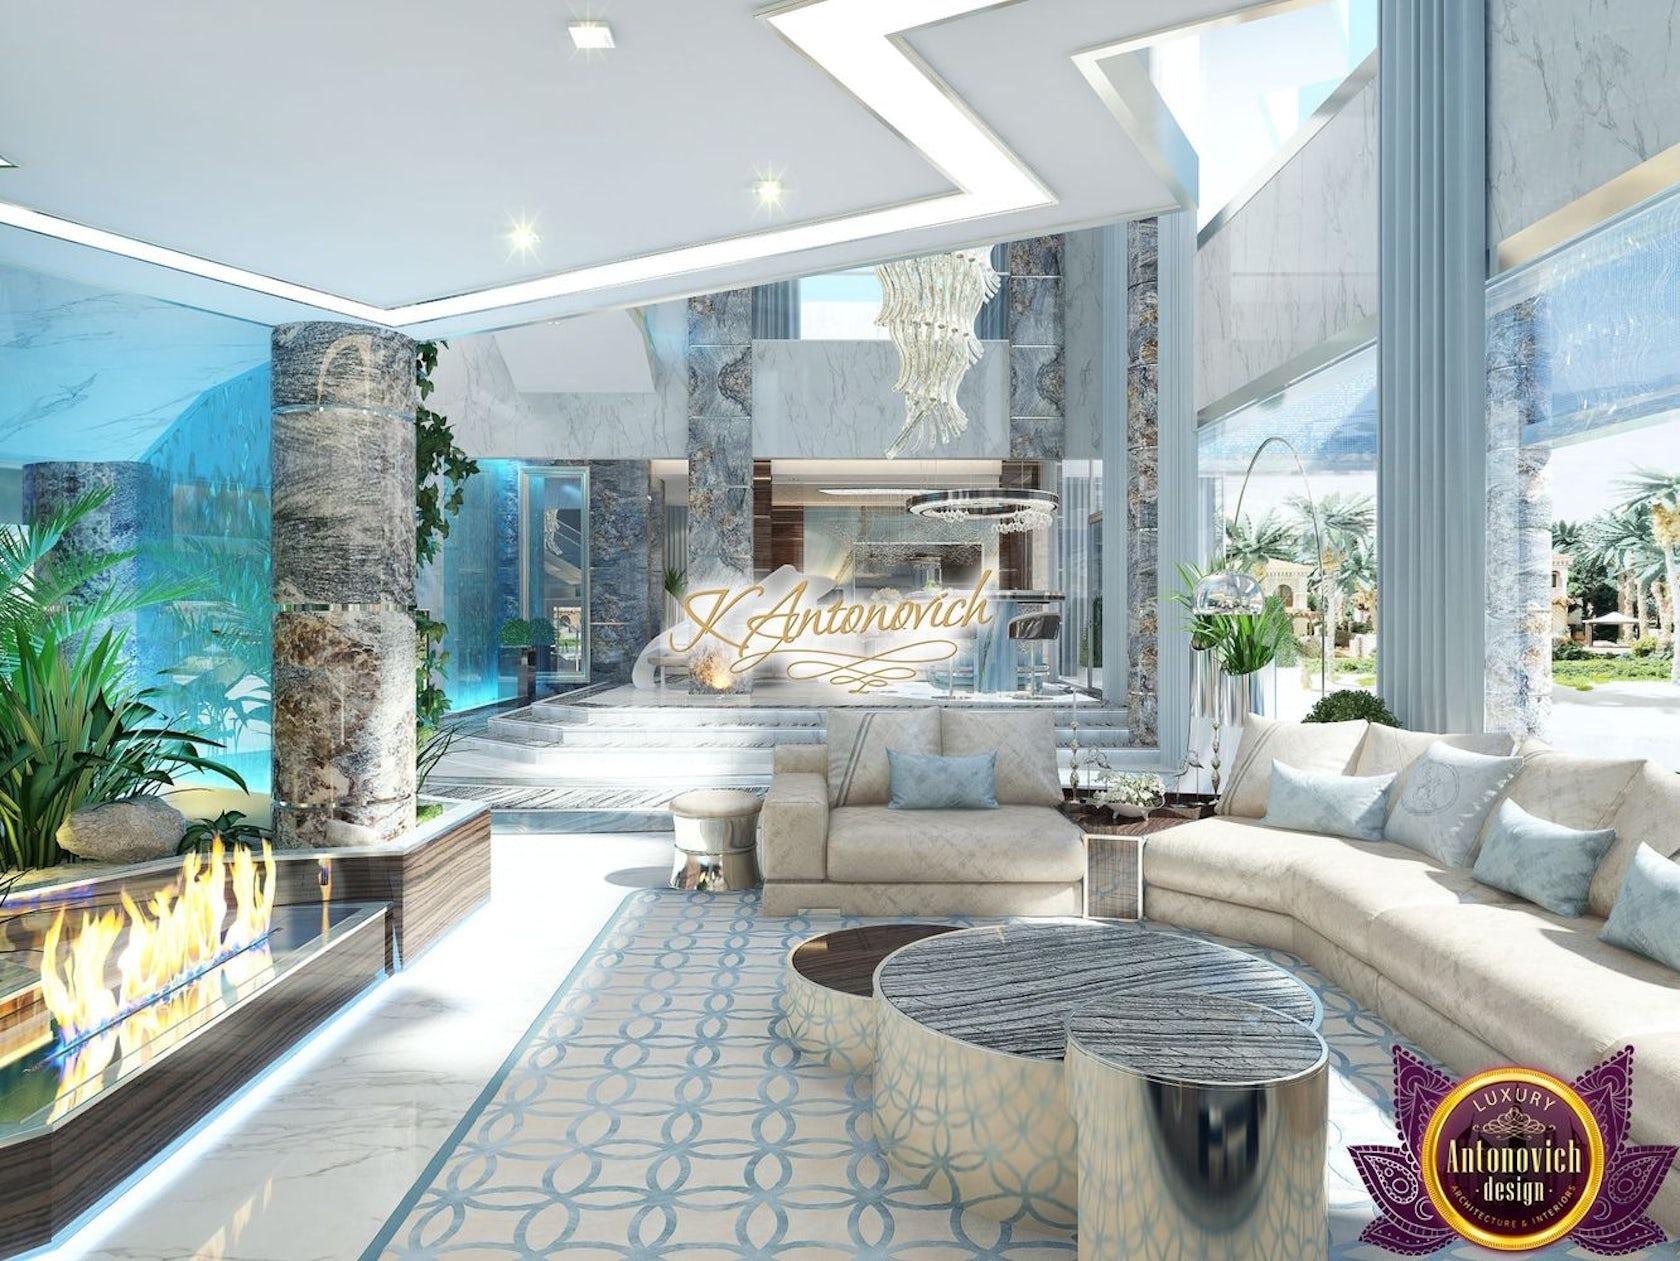 Luxury Interior Design Projects In Dubai Uae From Katrina Antonovich On Architizer